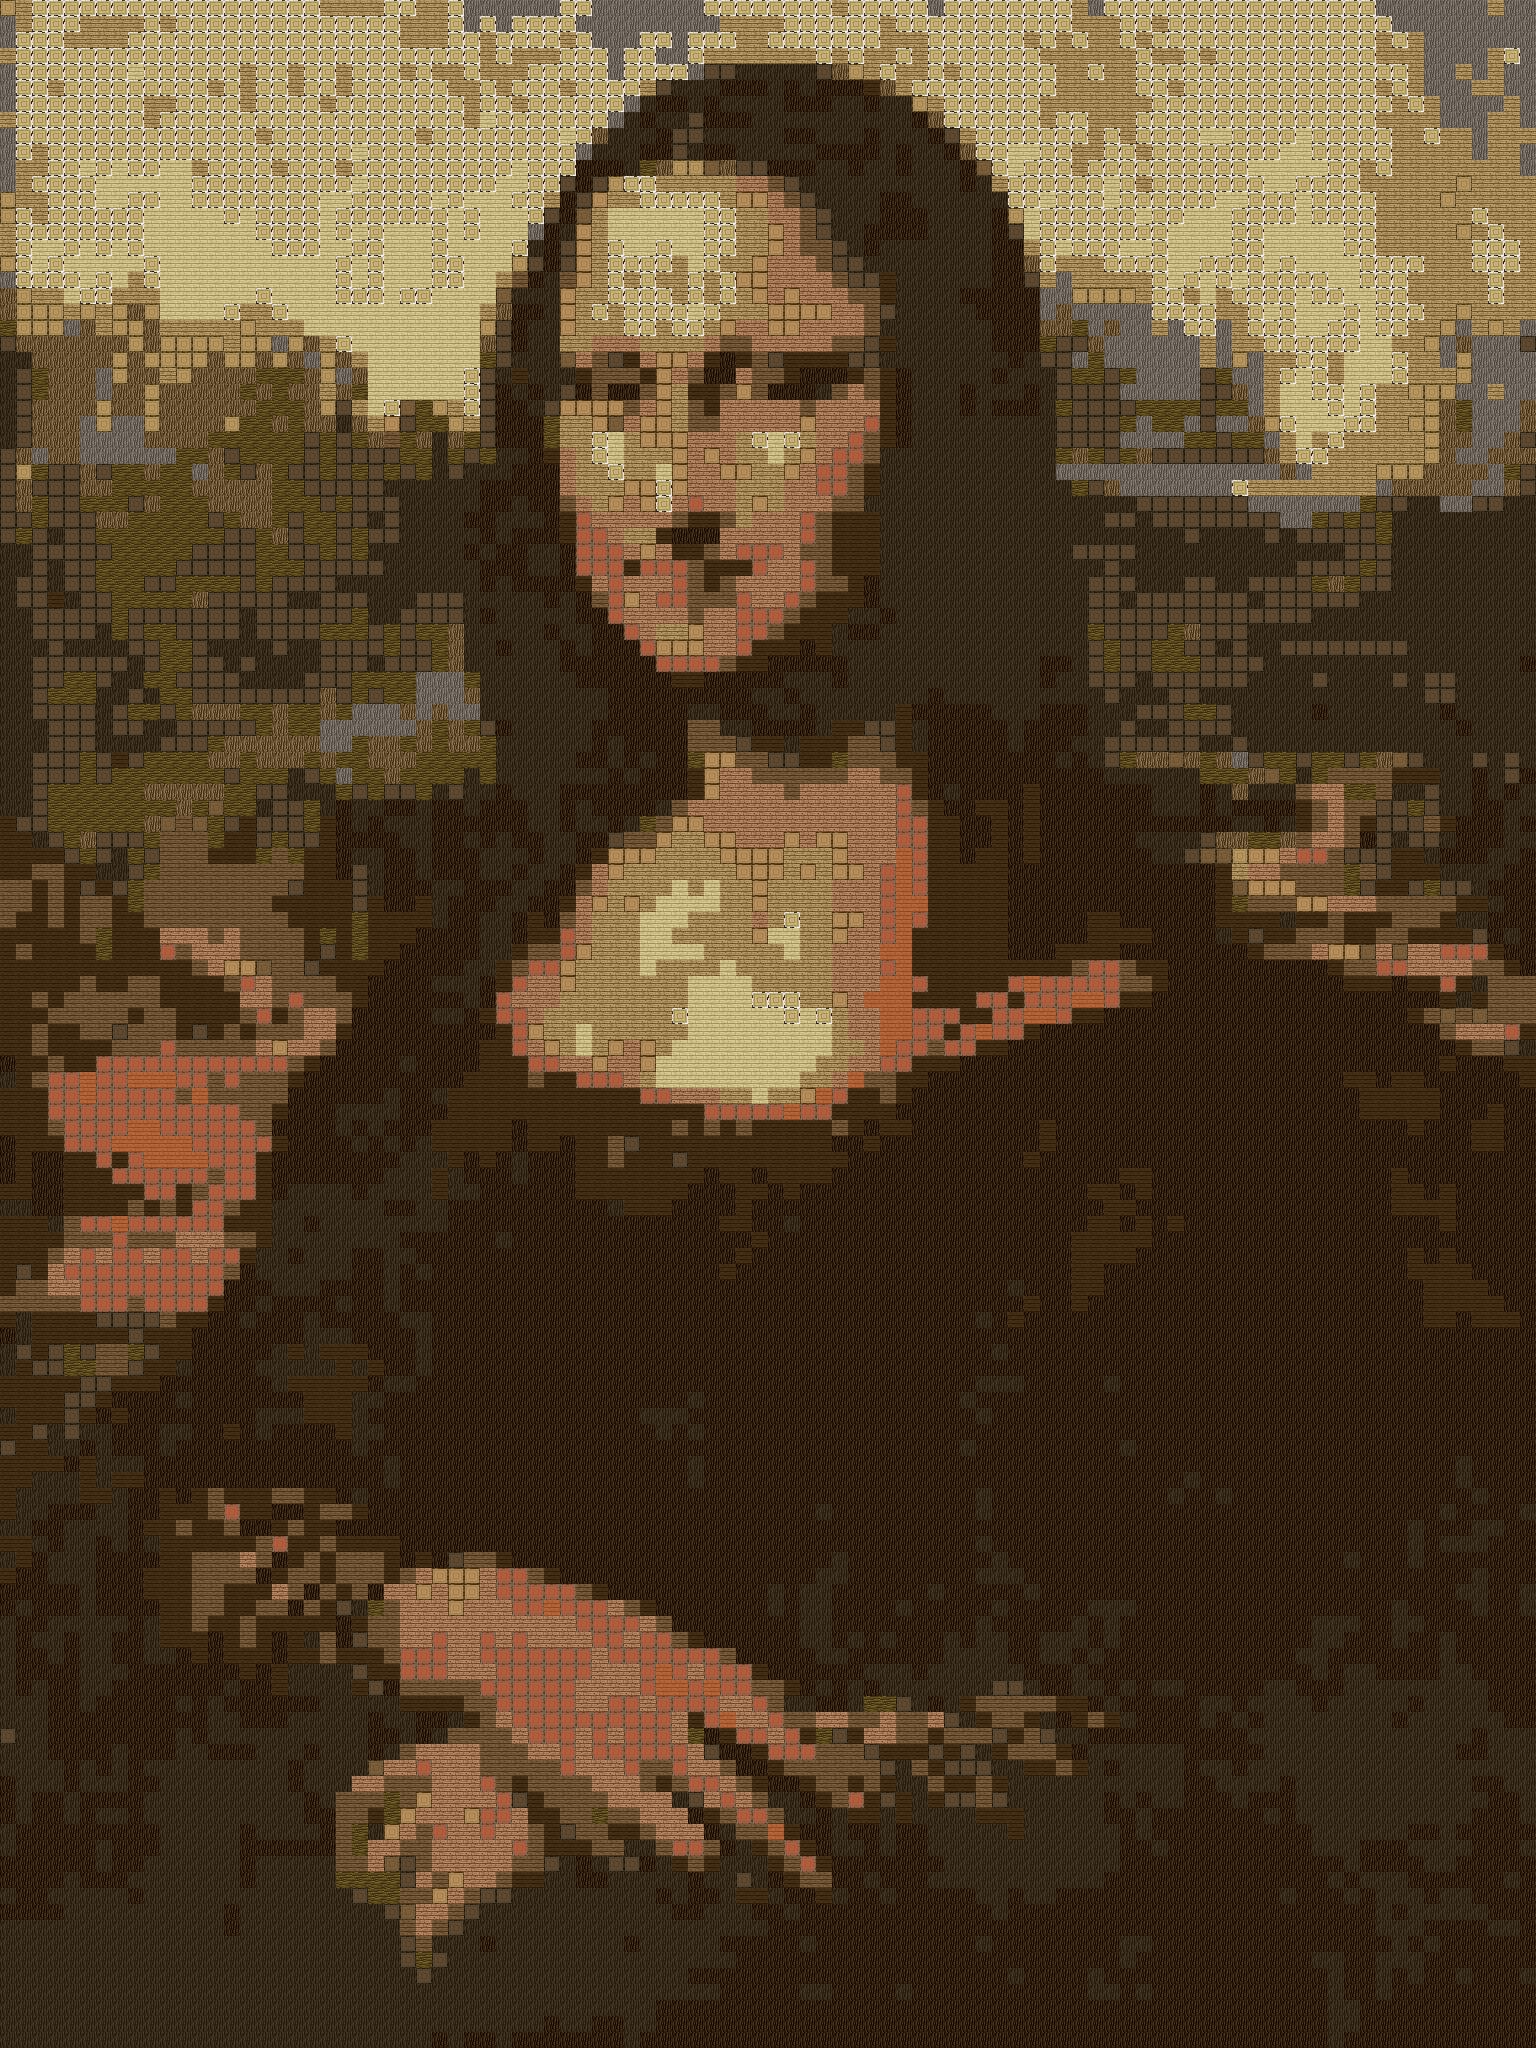 minecraft_dot (3).png